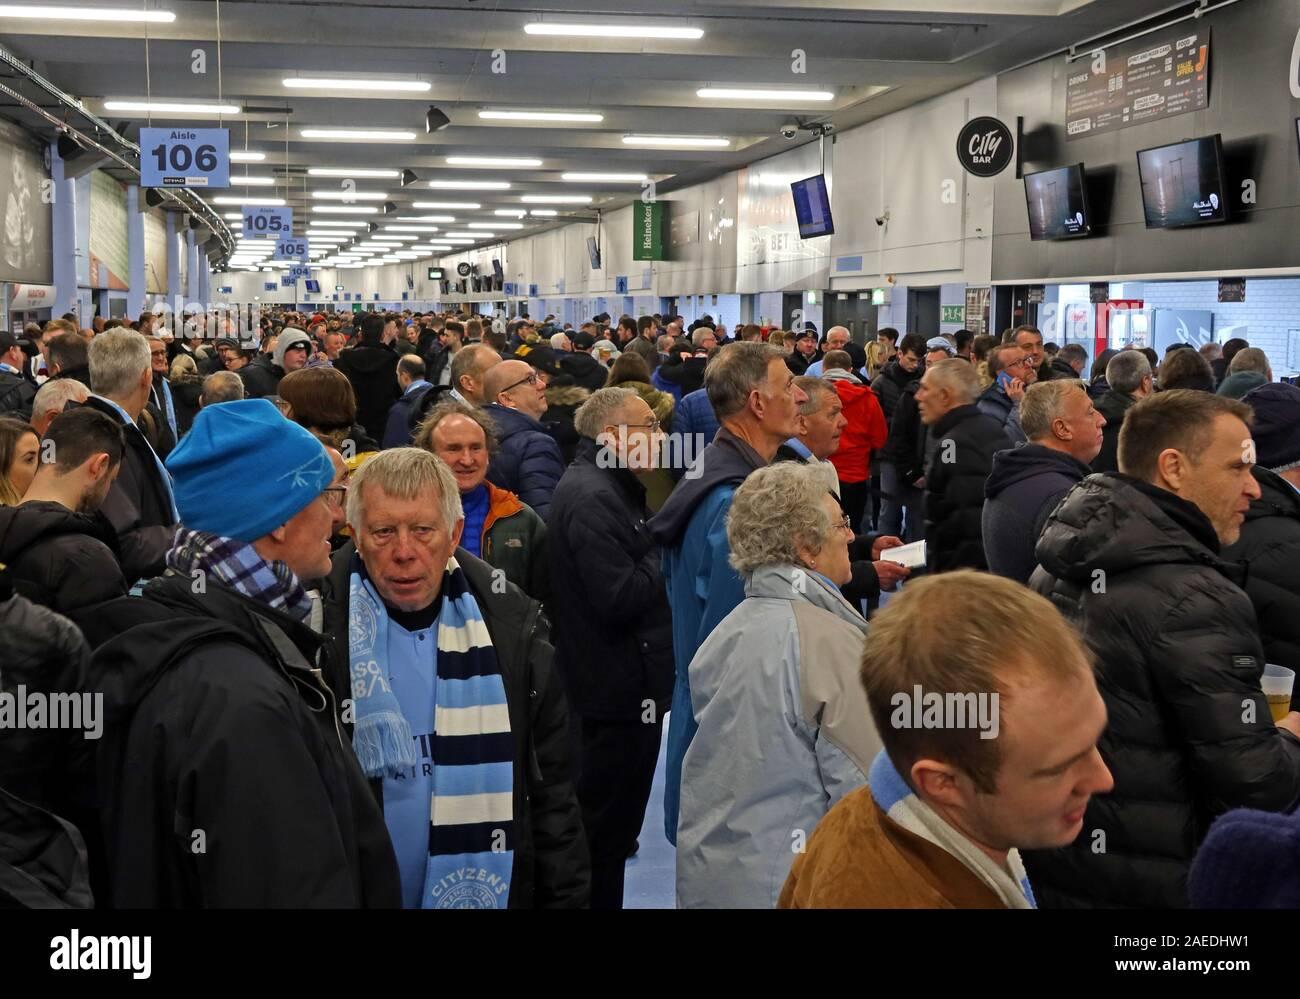 Dieses Stockfoto: MCFC Fans,Etihad Stadion,Manchester City Football Club,Spiel - 2AEDHW